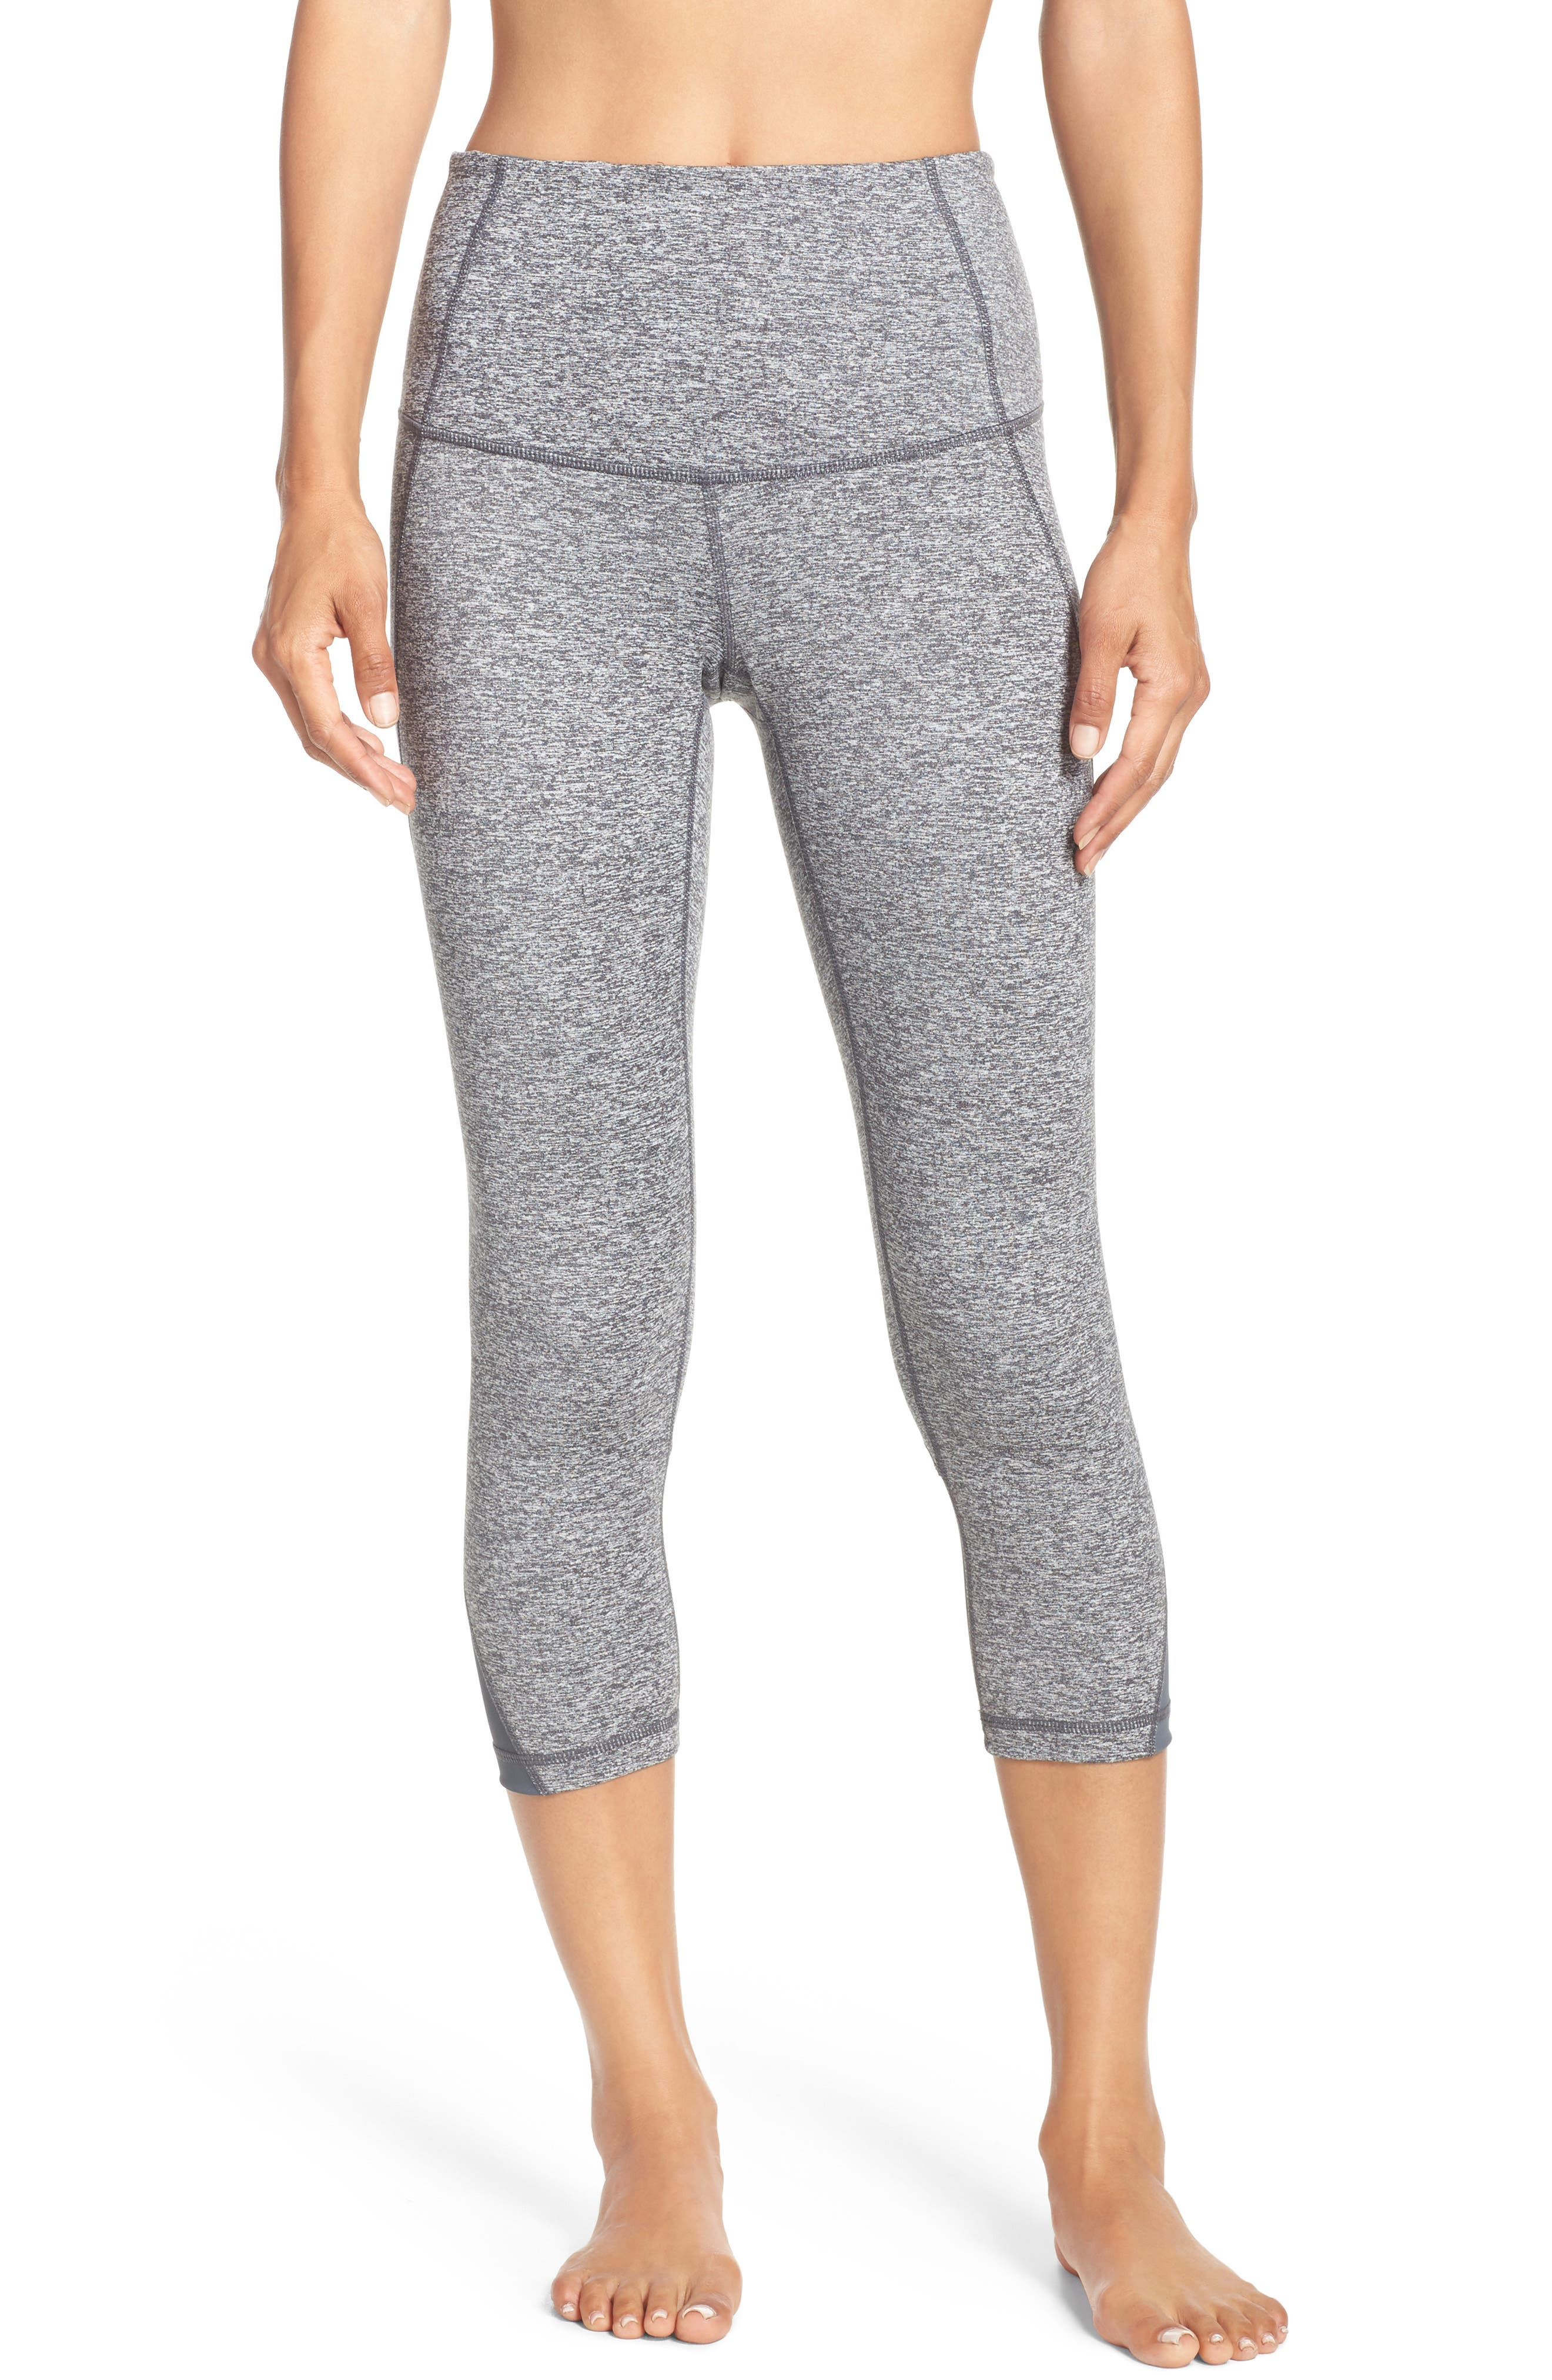 Pants for Women: White, Black, Wool, Twill & More | Nordstrom